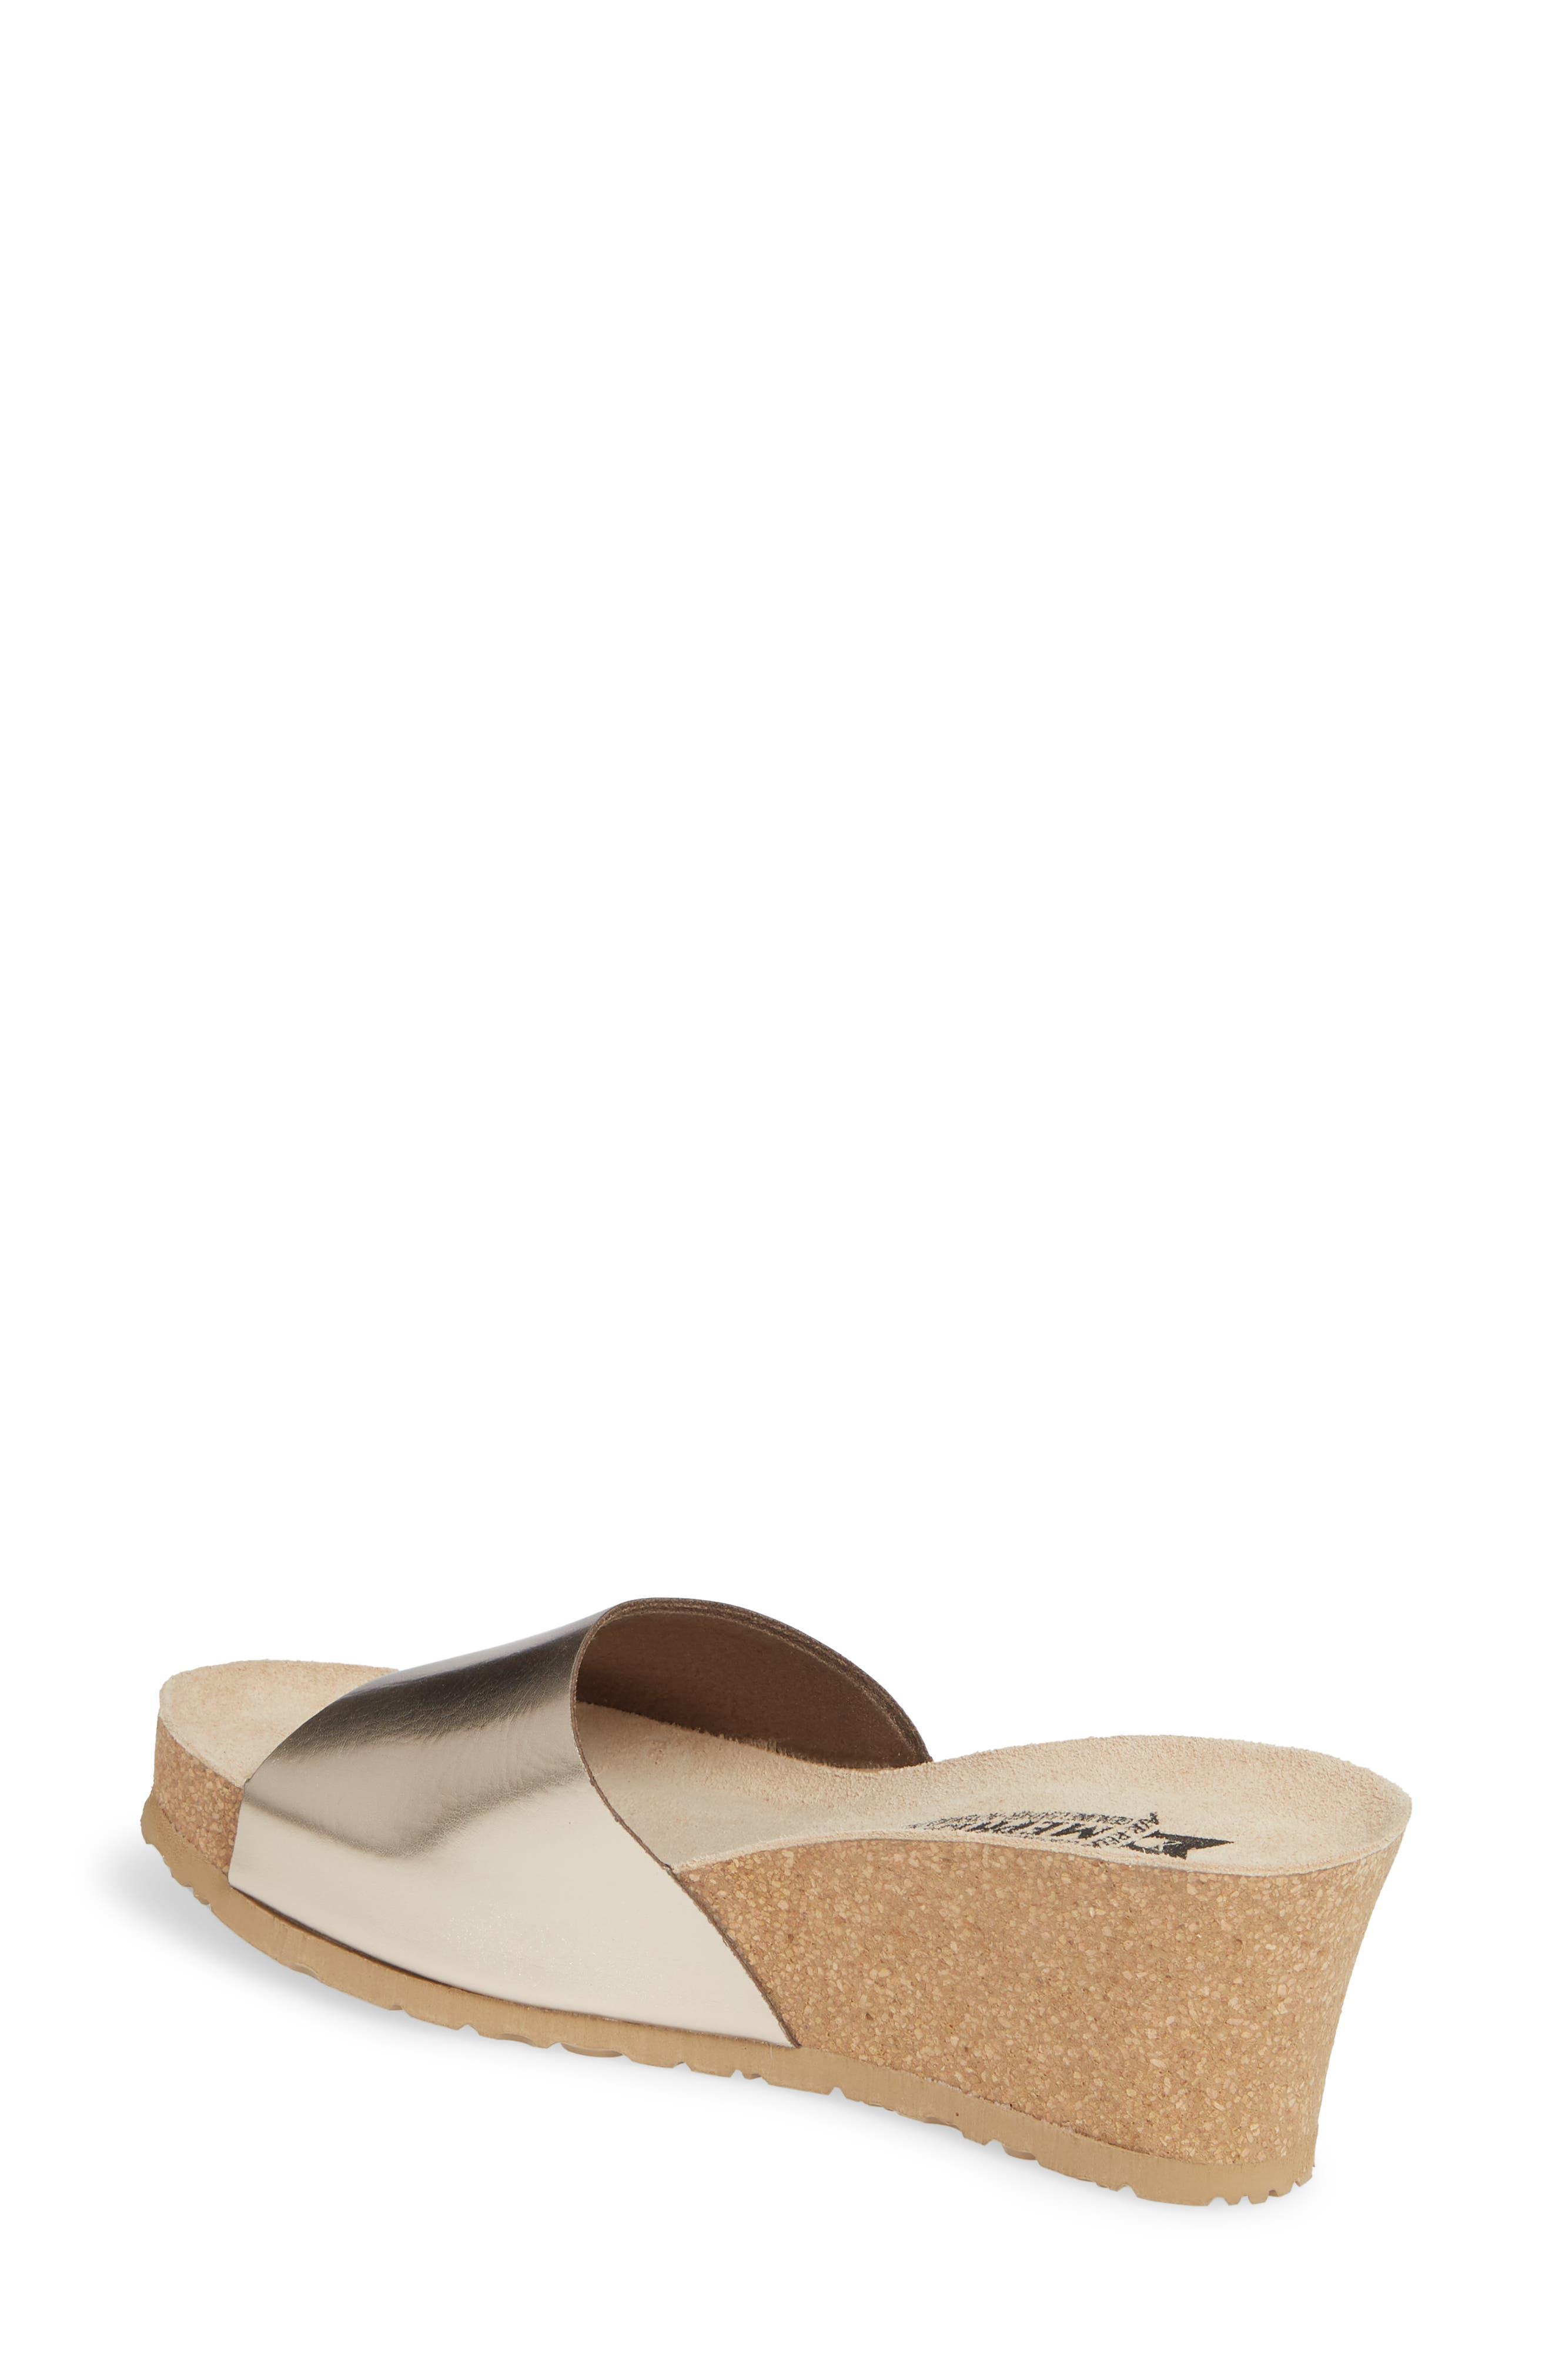 MEPHISTO, Lise Platform Wedge Sandal, Alternate thumbnail 2, color, PLATINUM LEATHER